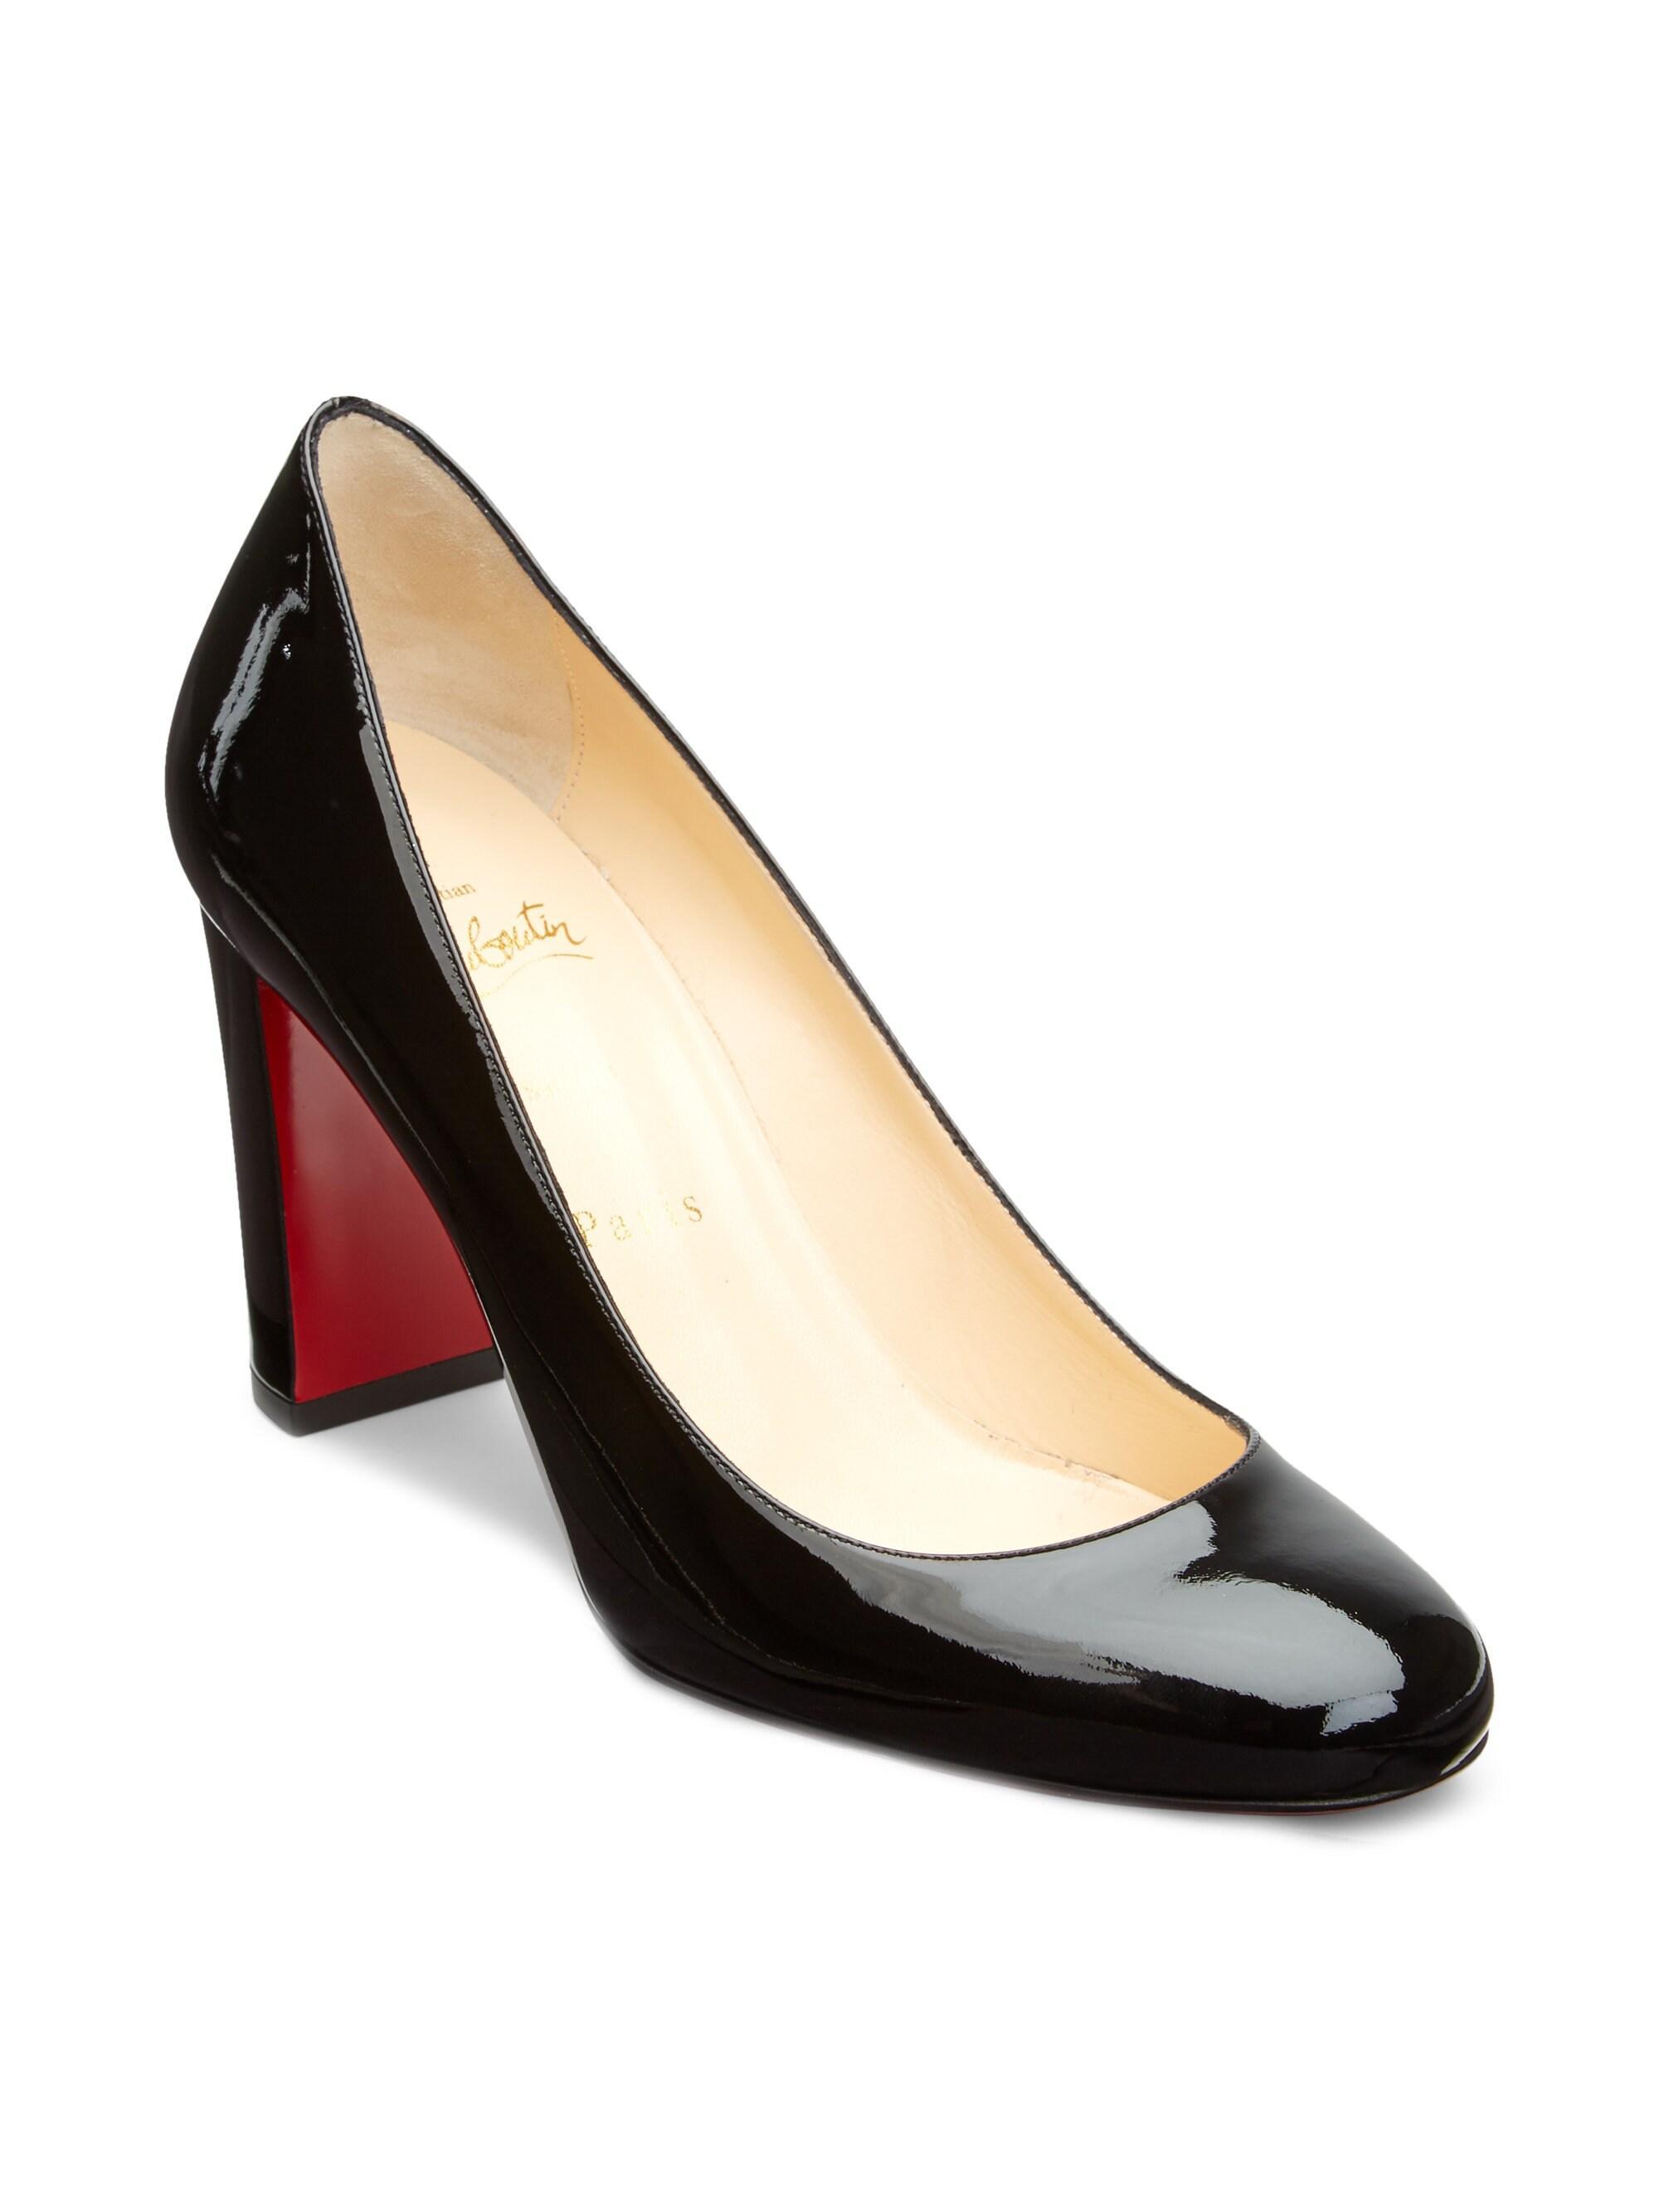 493fcd20bd3 Women's Lady Gena 85 Black Patent Leather Pumps